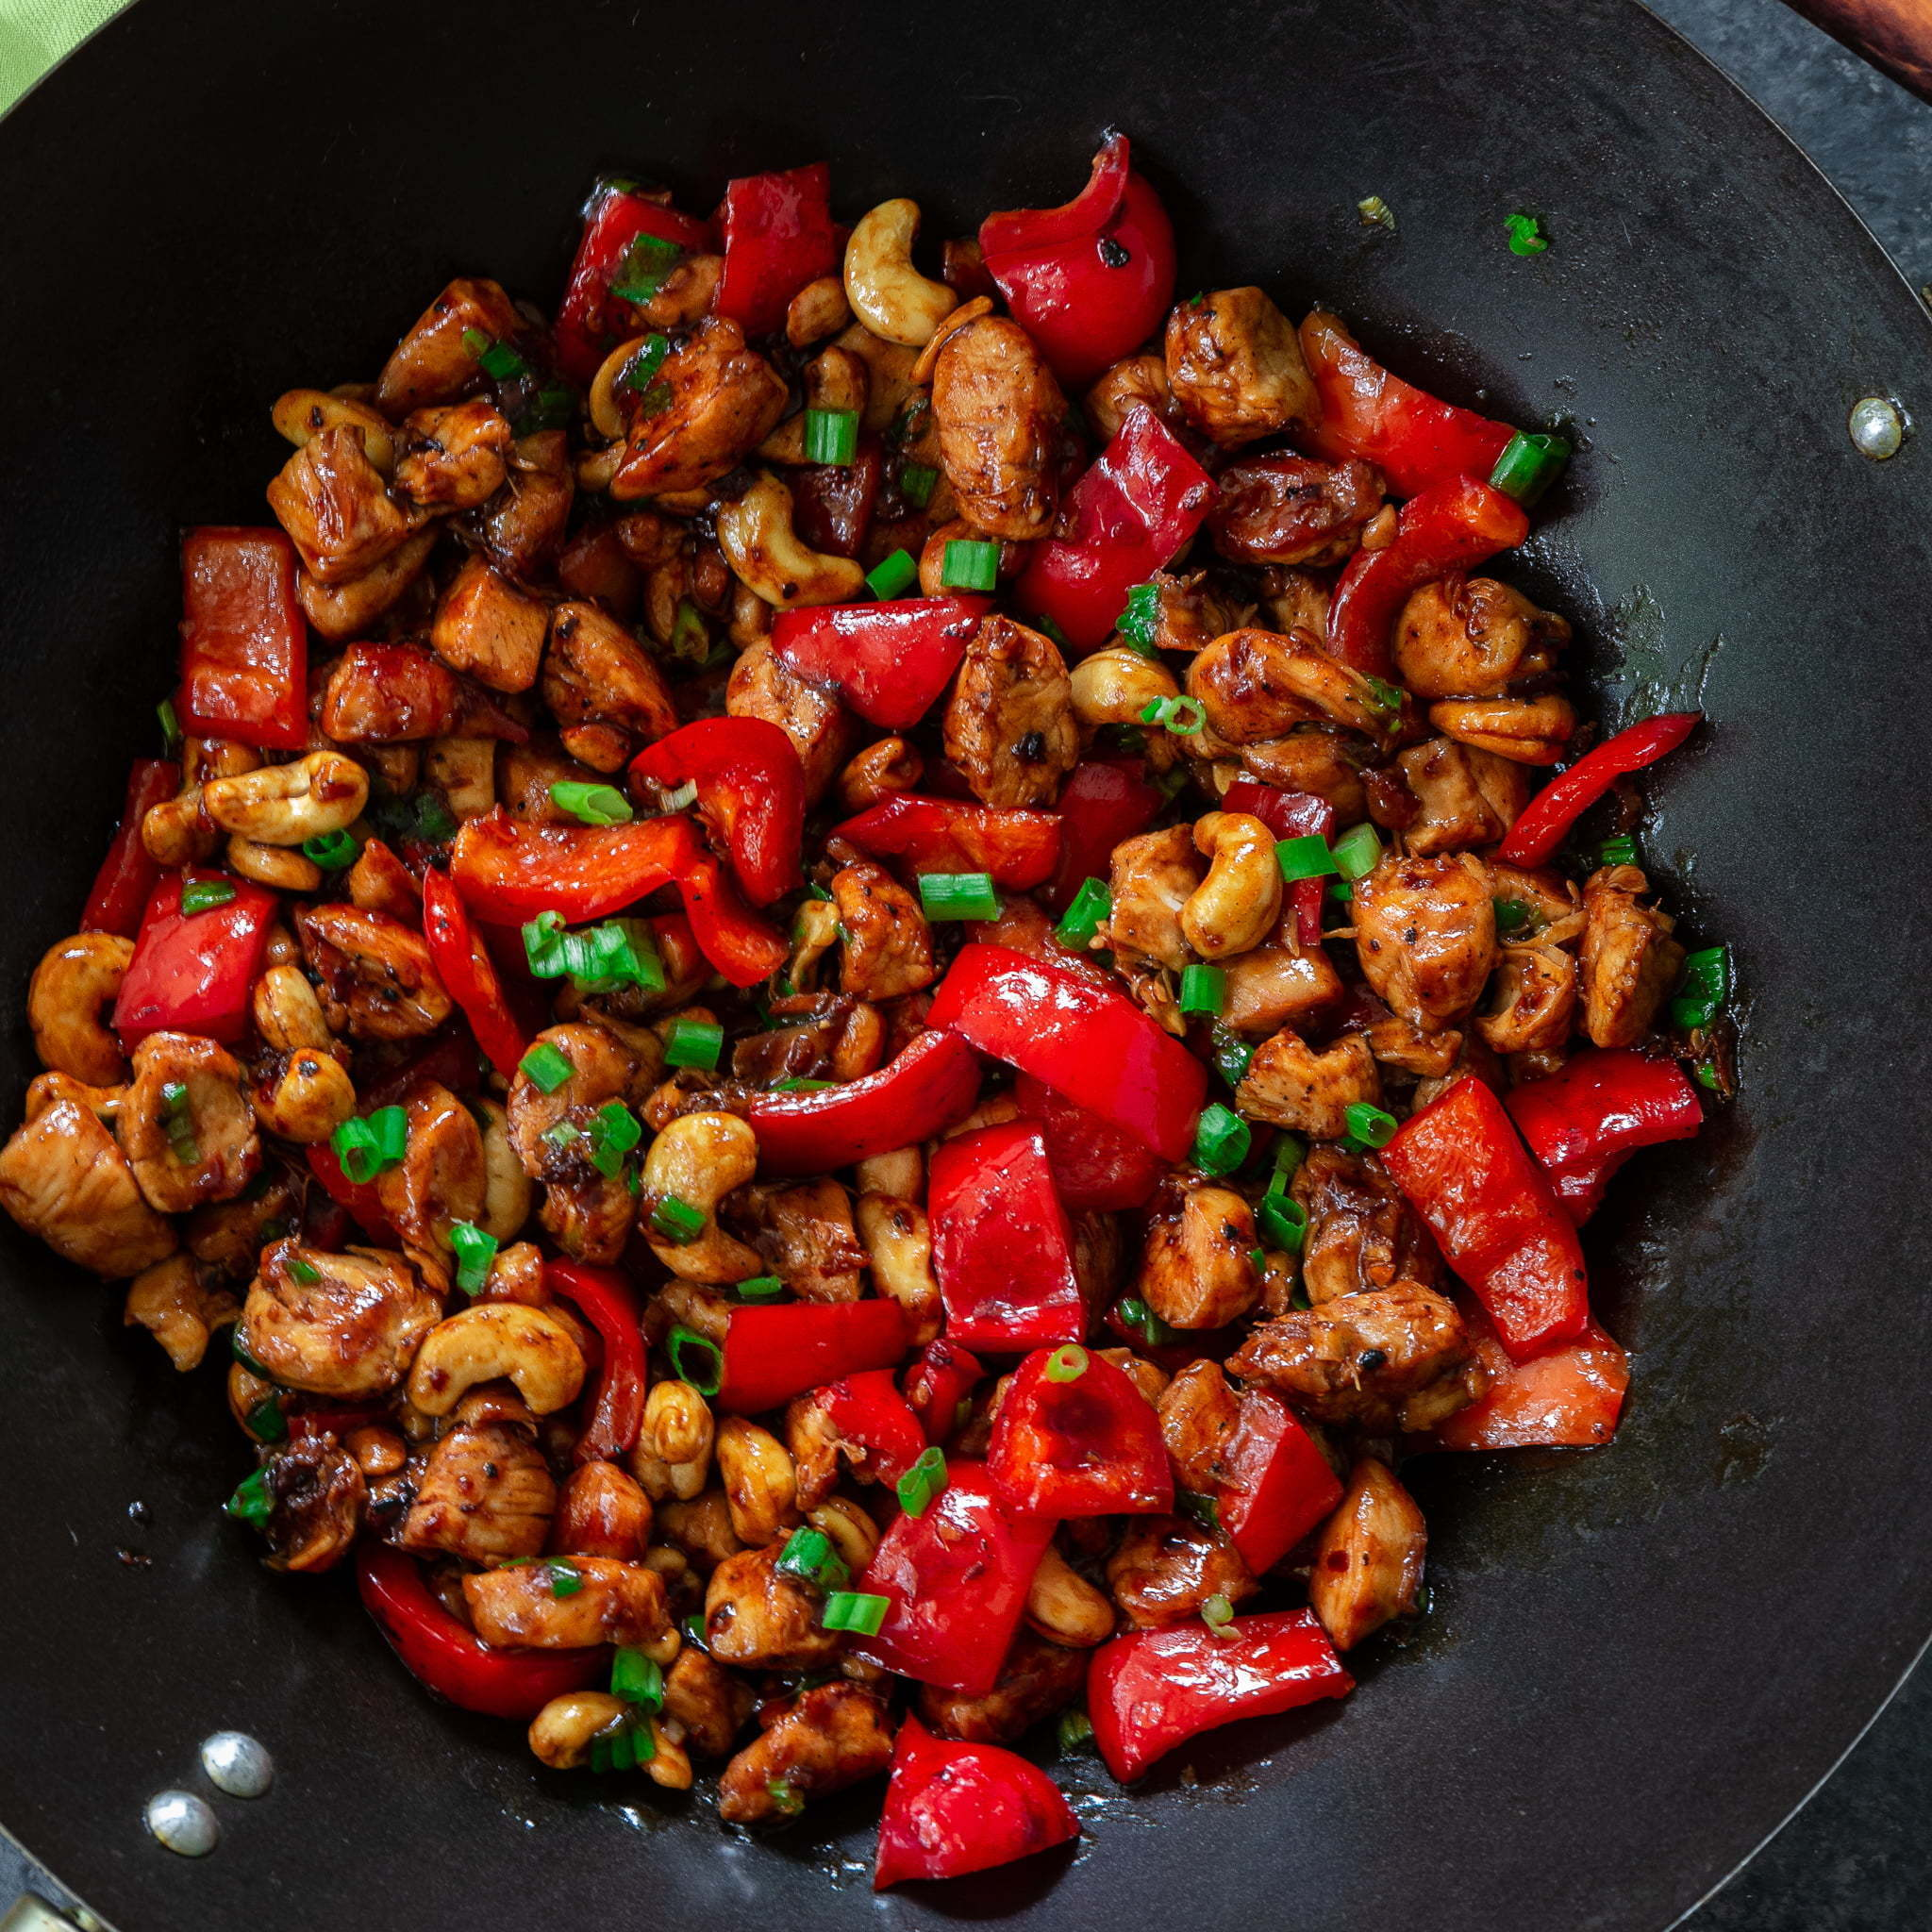 Olivia S Cuisine: Meal Prep Cashew Chicken